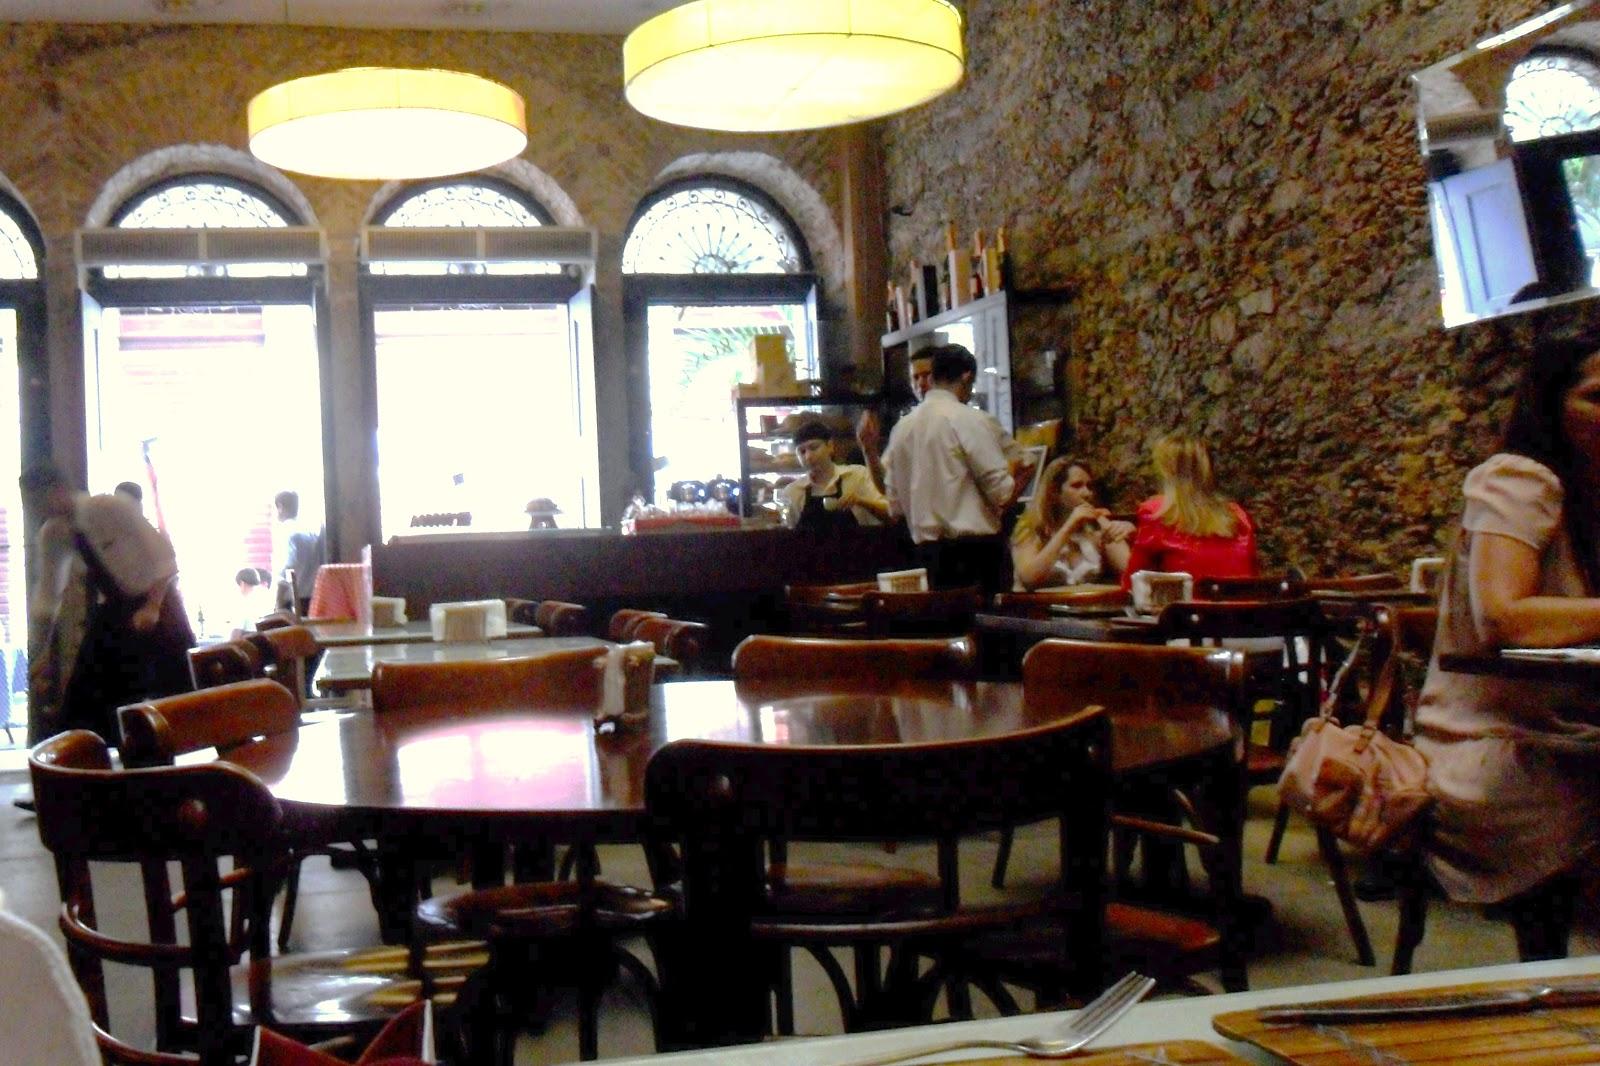 cadeira voadora: Rio de Janeiro para cadeirantes 5 – Restaurantes #989333 1600x1066 Banco Banheiro Cadeirante